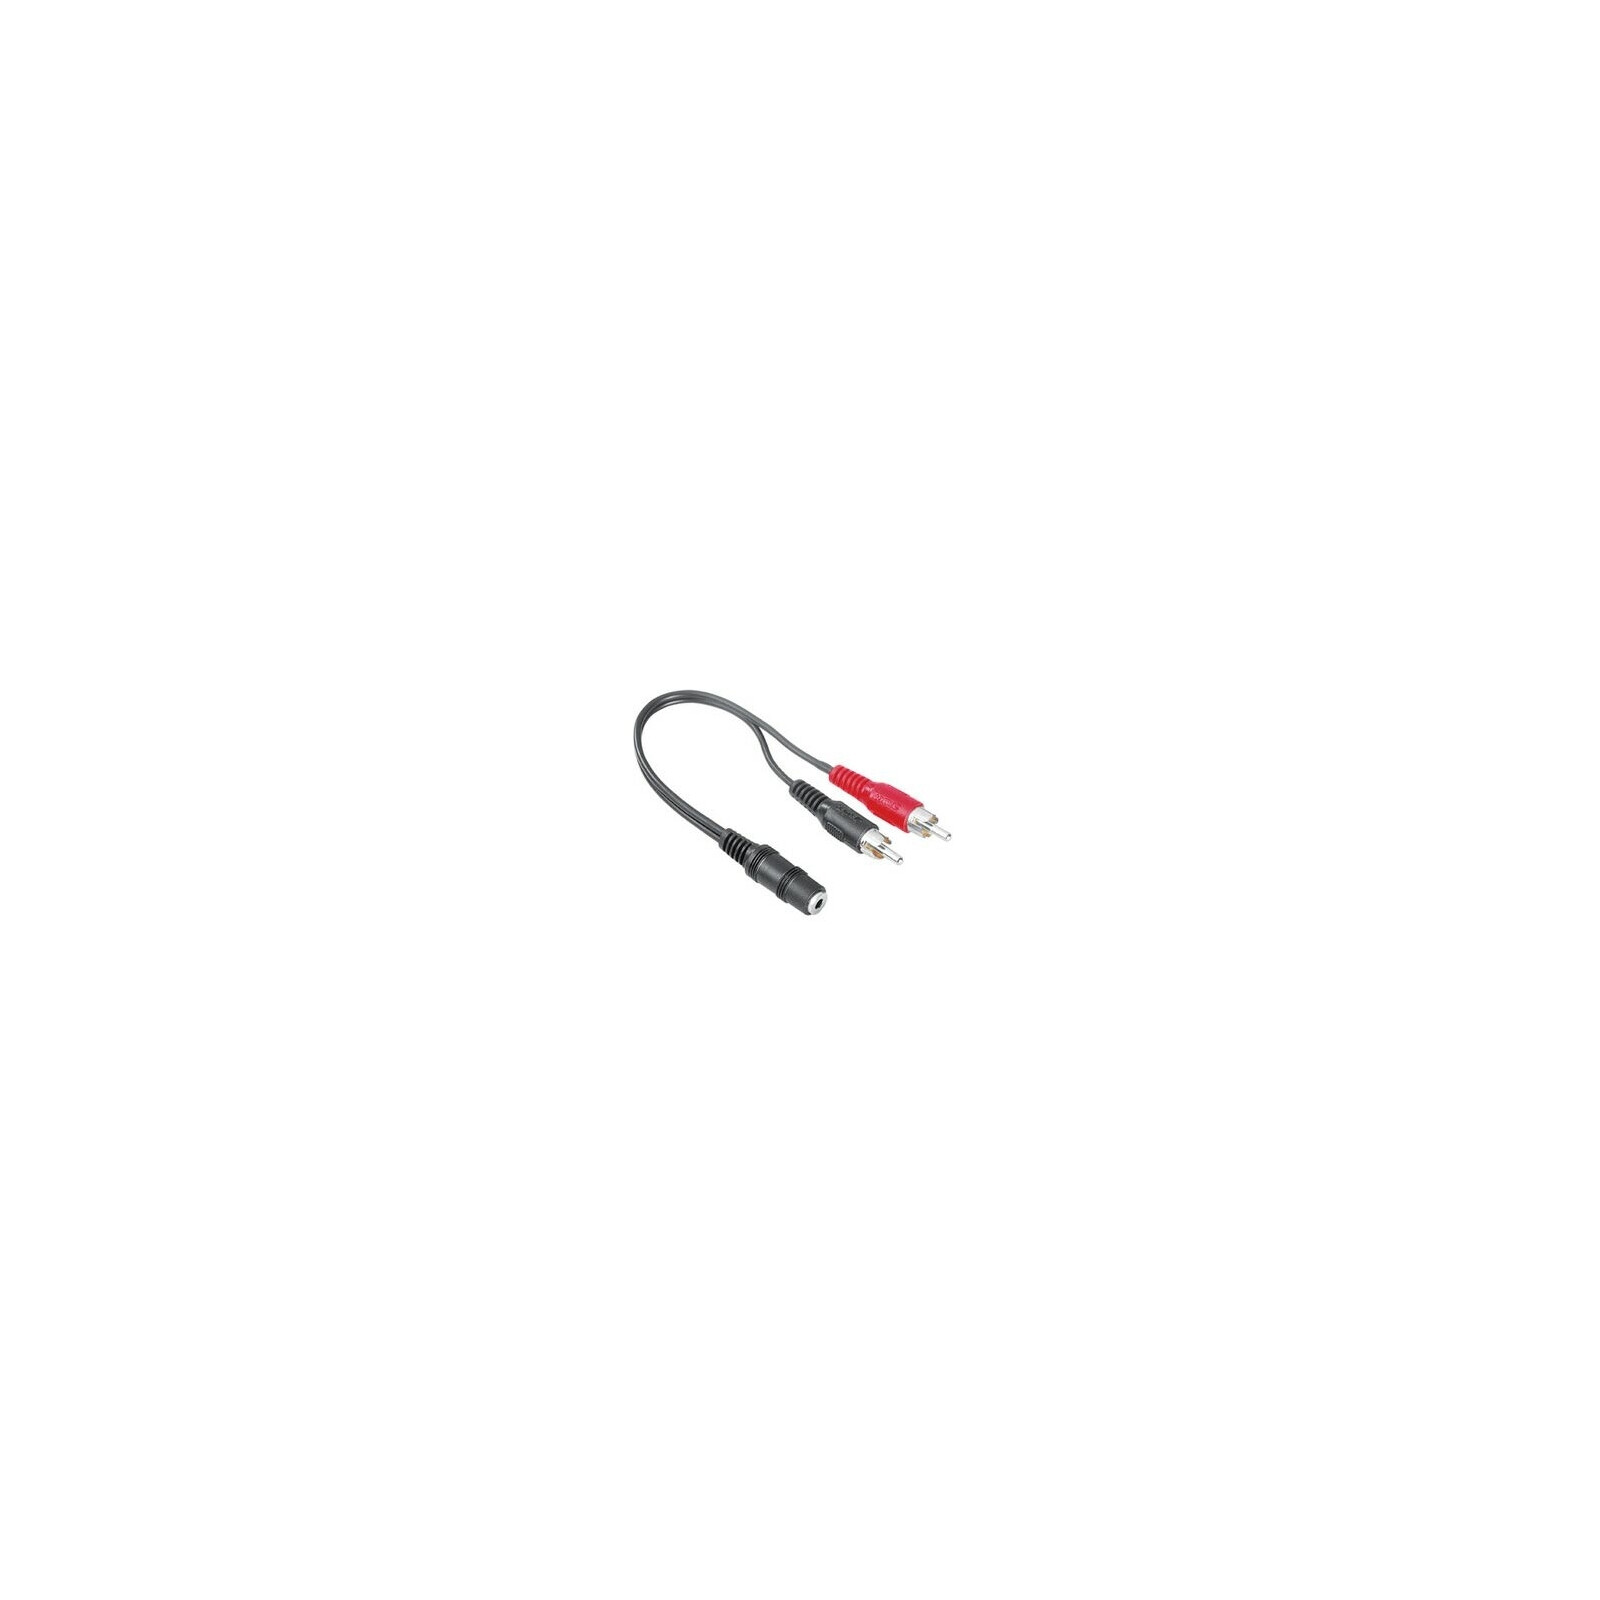 Hama 48920 2 Cinch-Stecker - 3,5-mm-Klinkenkupplung Stereo